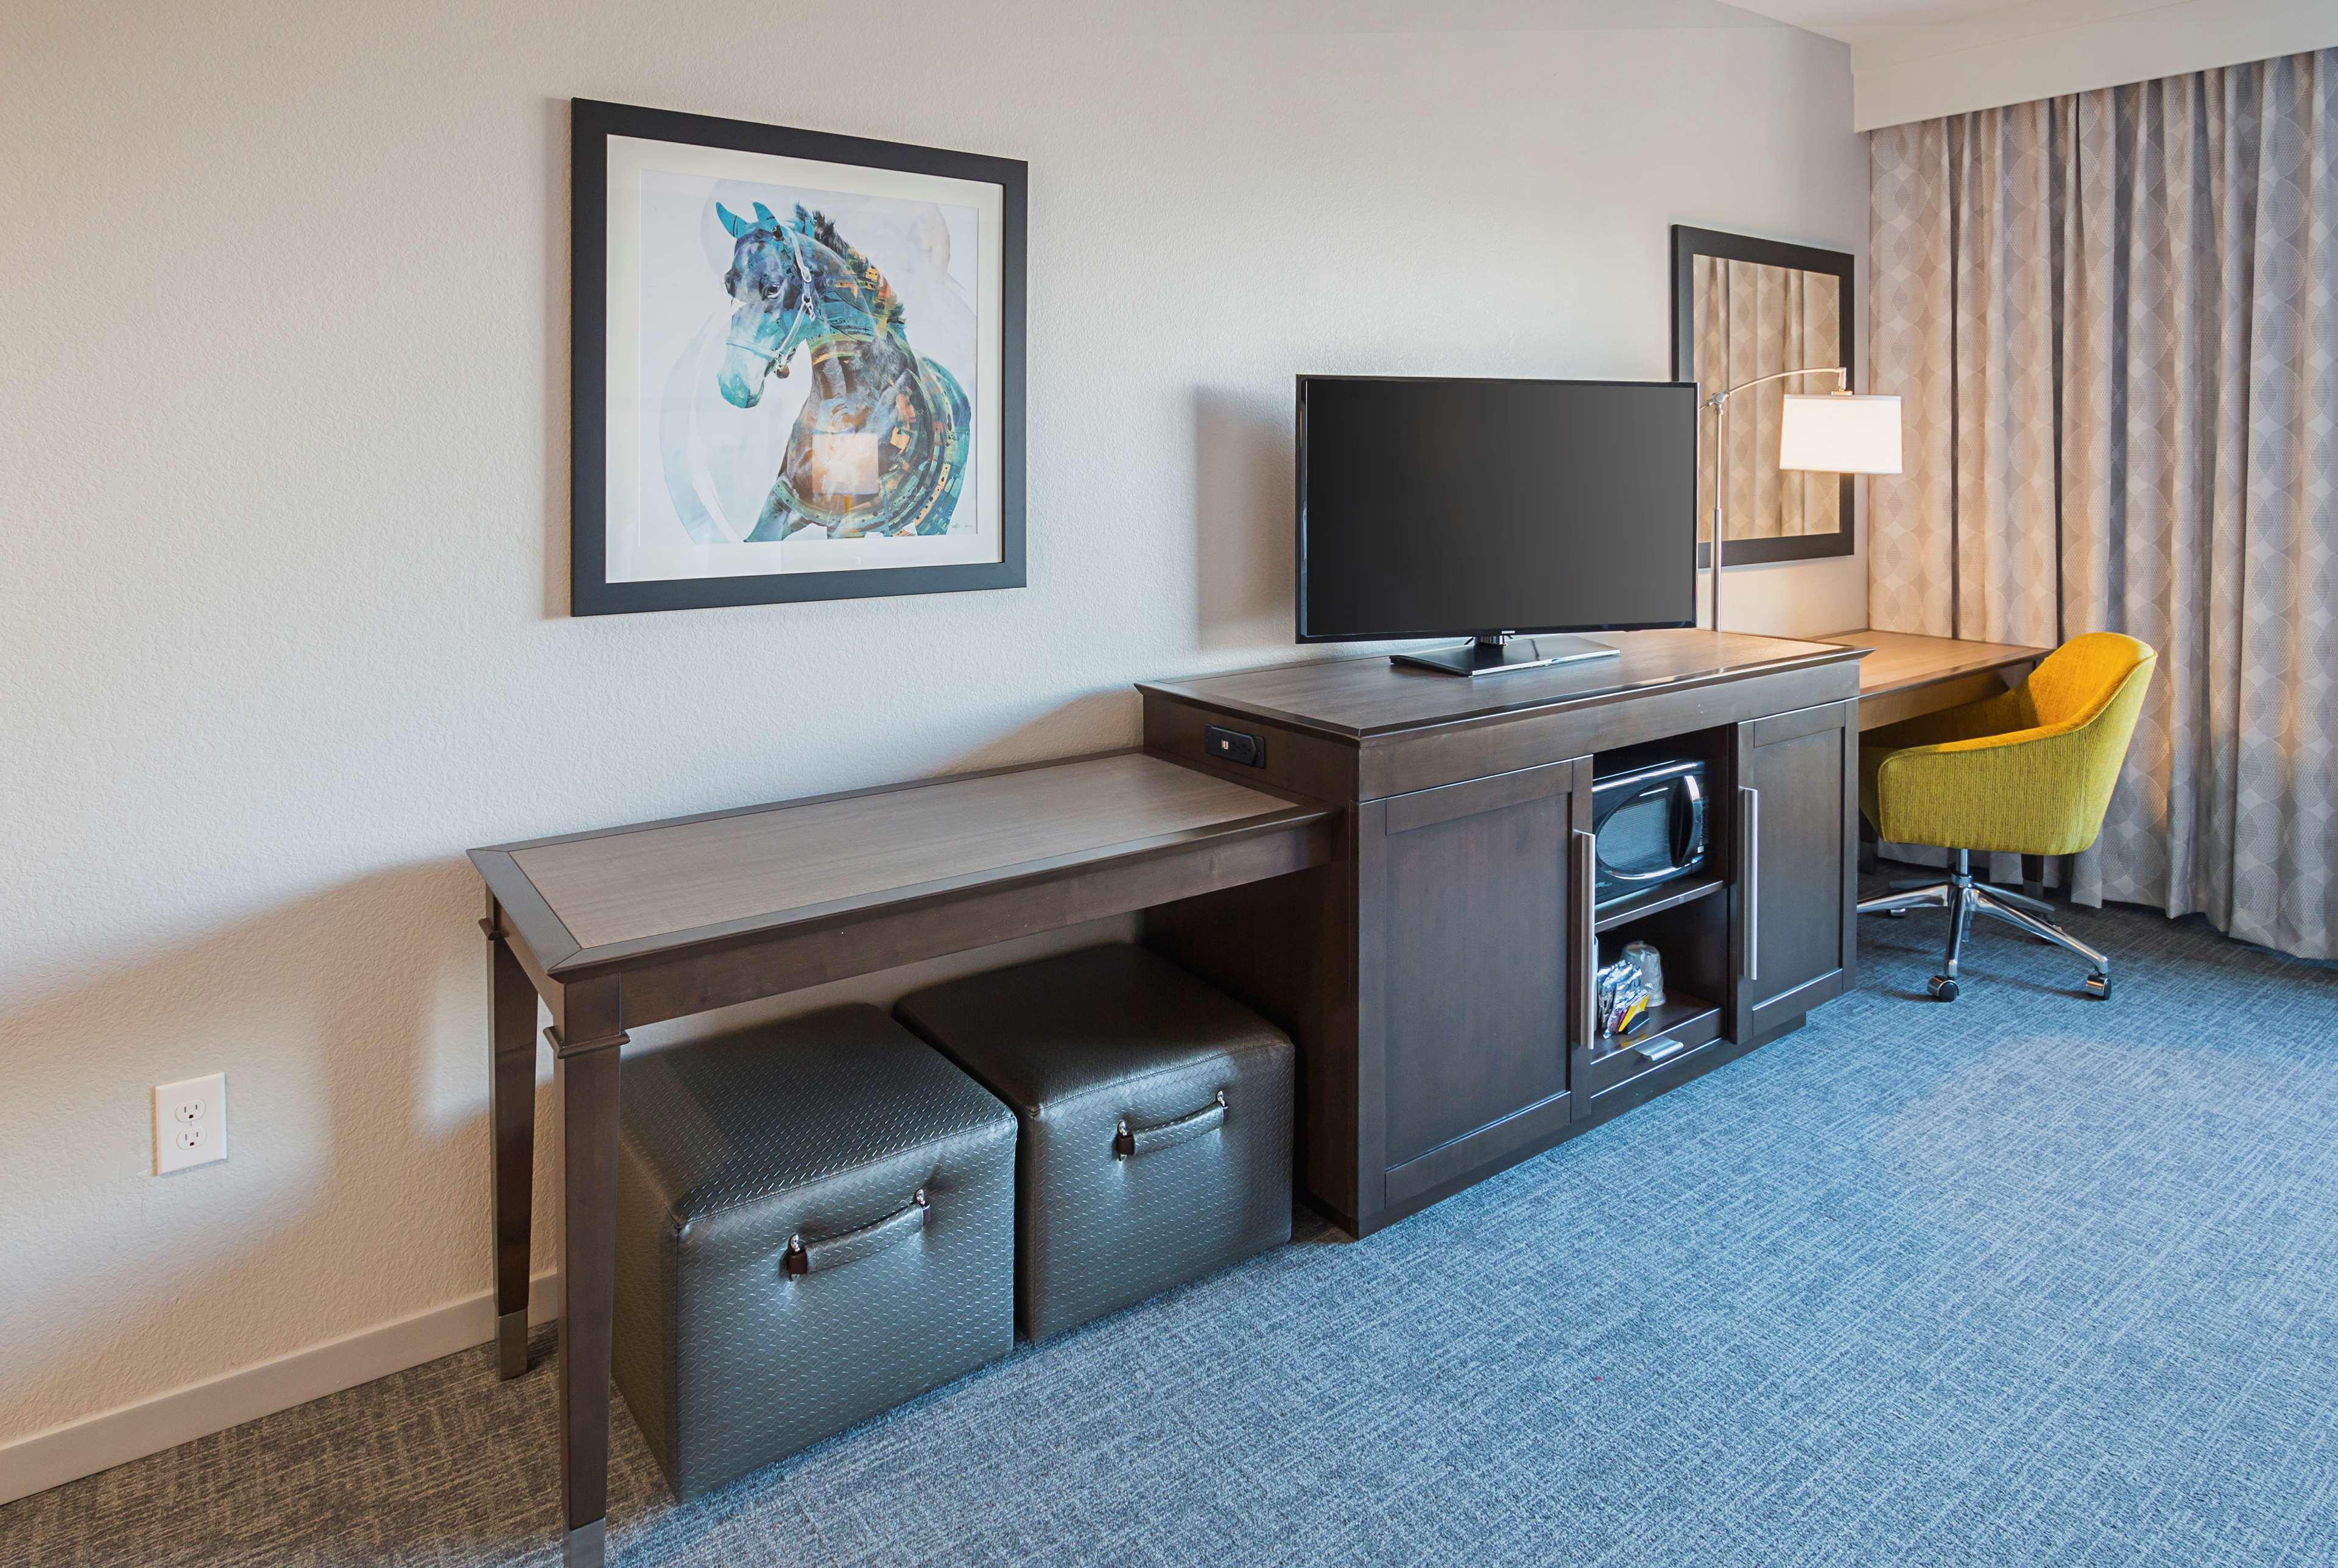 Hampton Inn & Suites Colleyville DFW West image 29